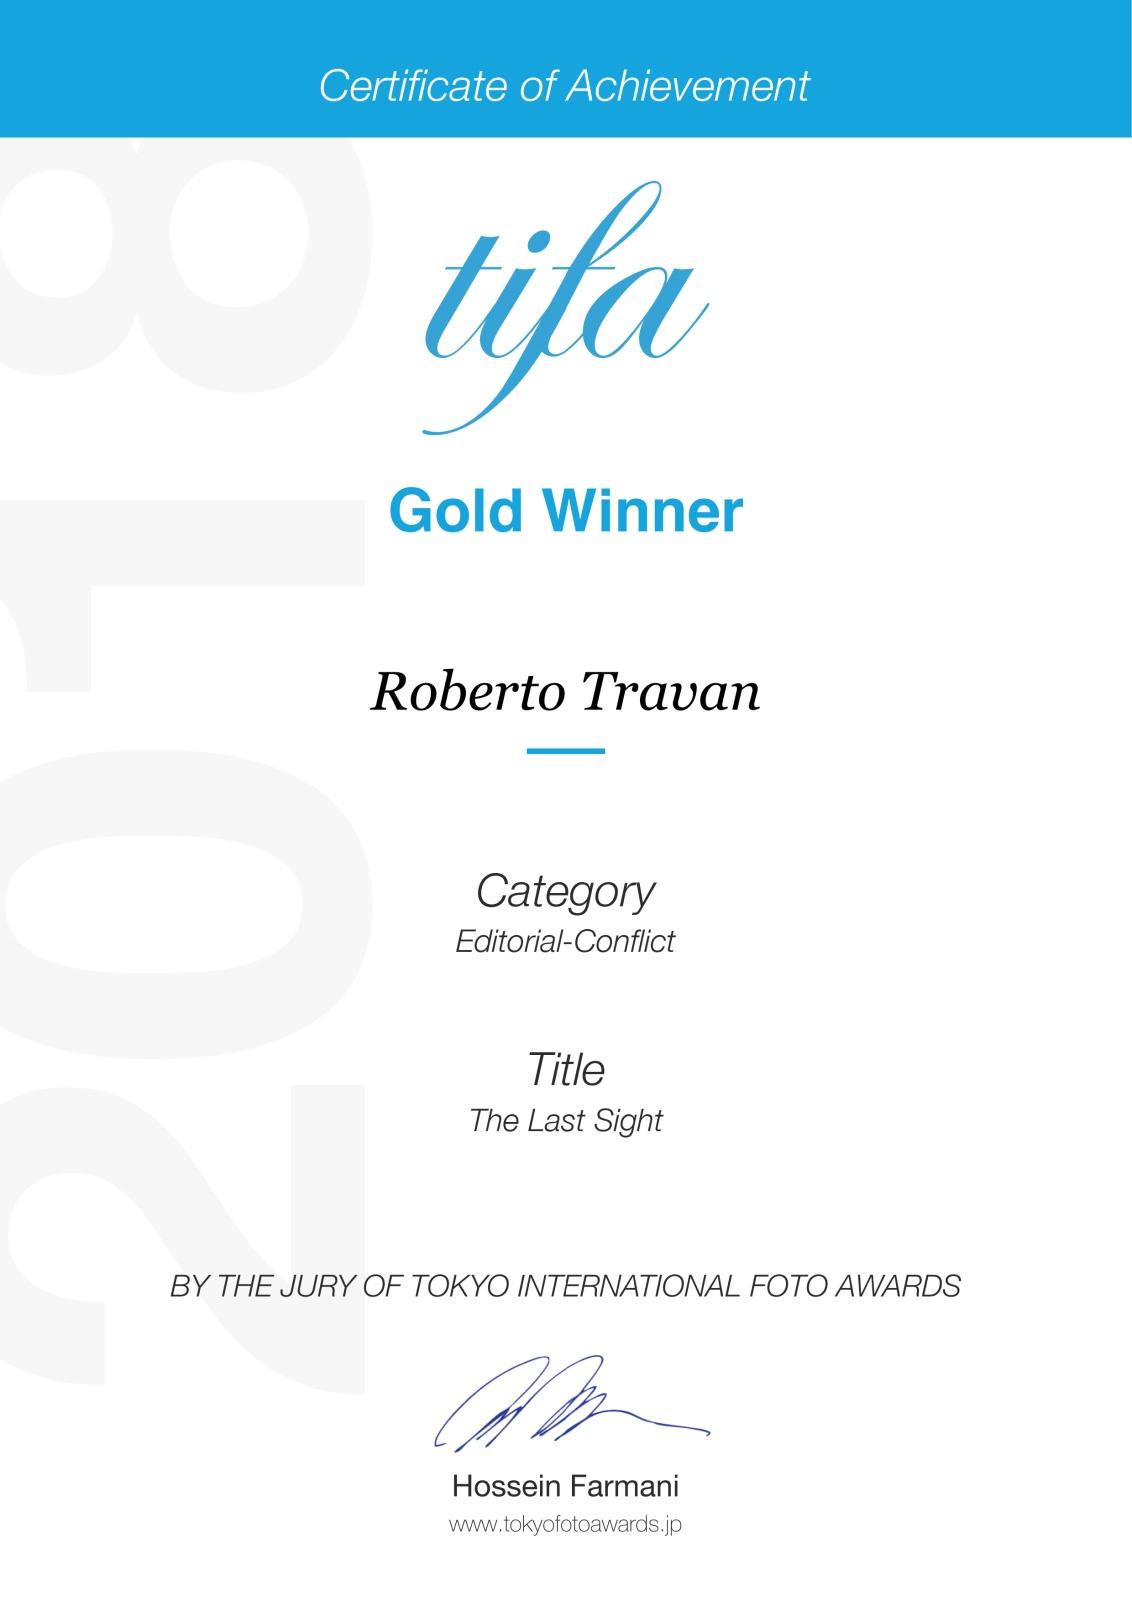 2018 - Tokyo International Foto Awards